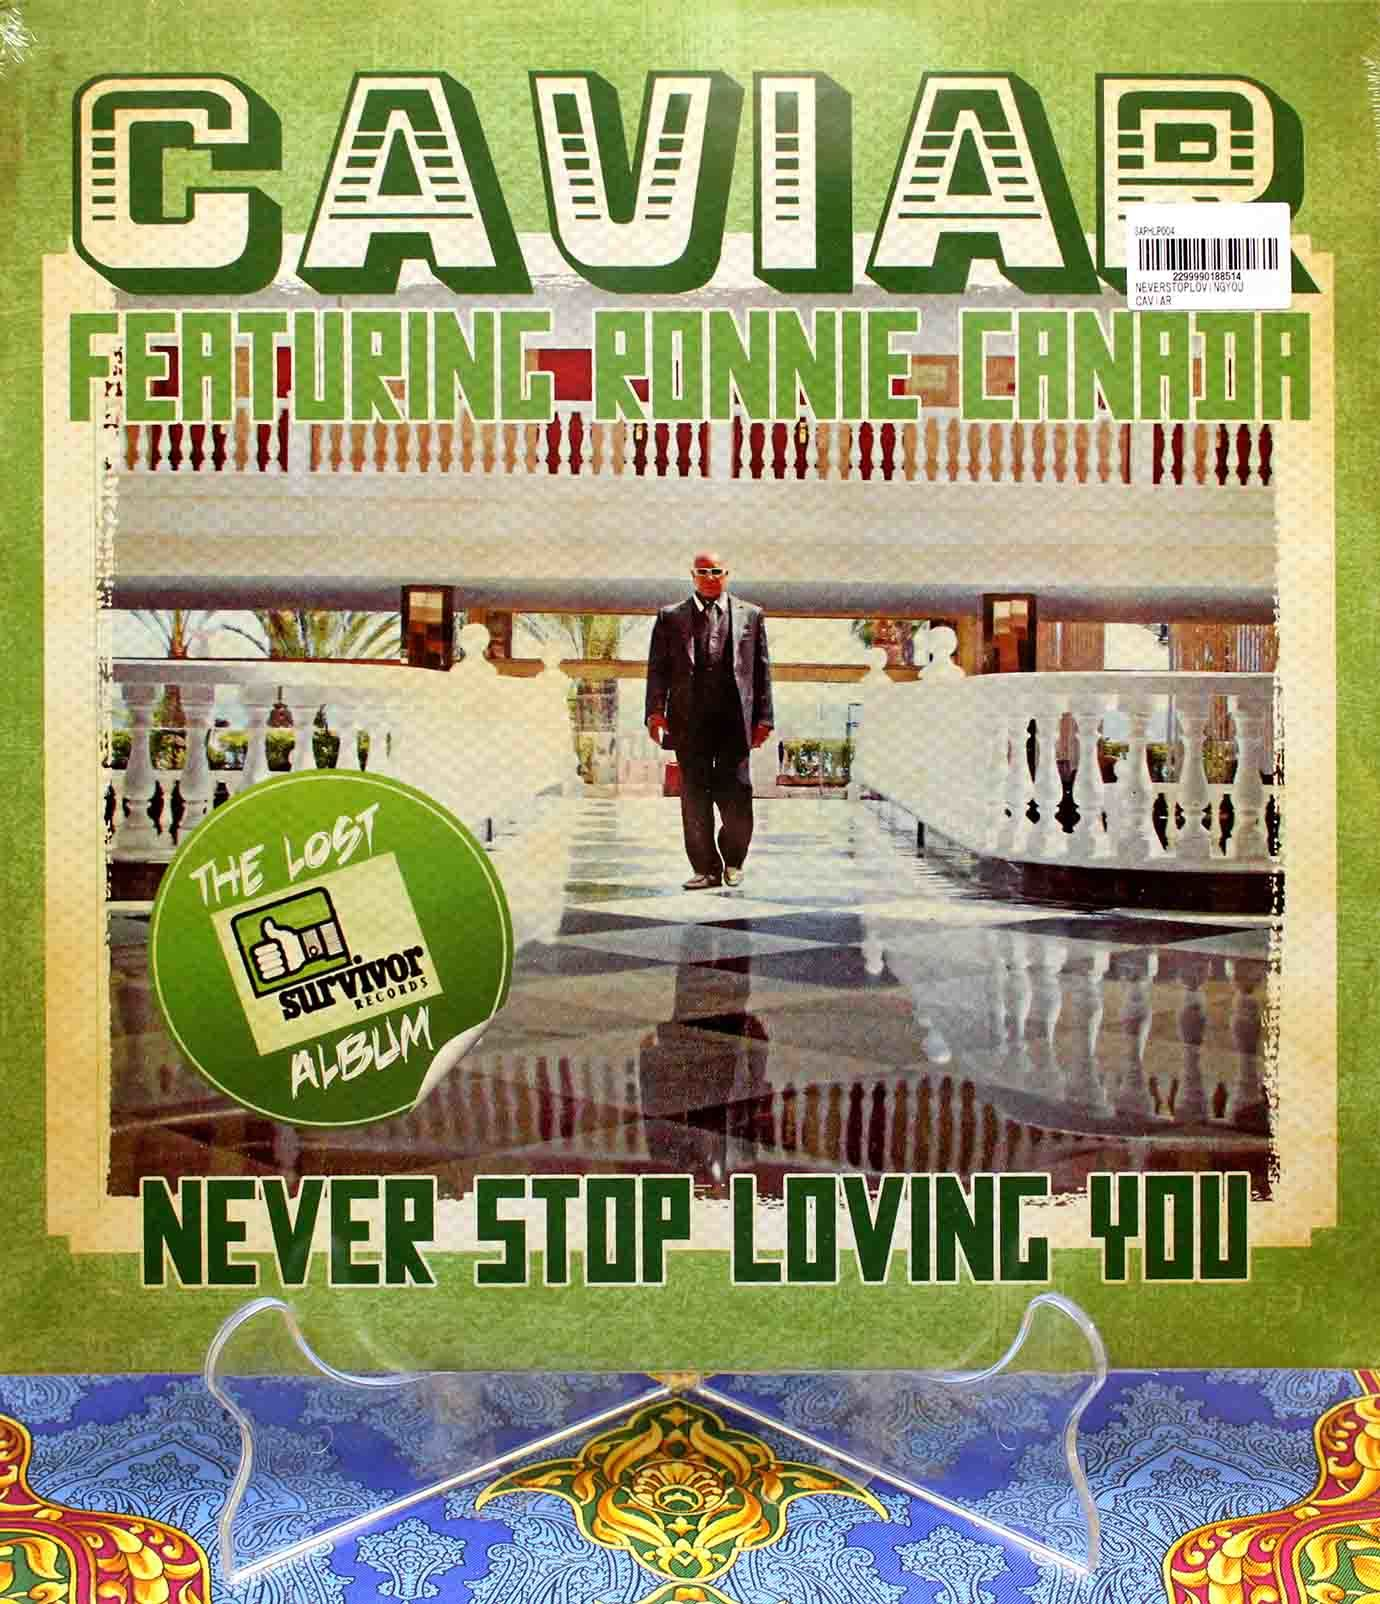 Caviar Never Stop Loving You LP 01